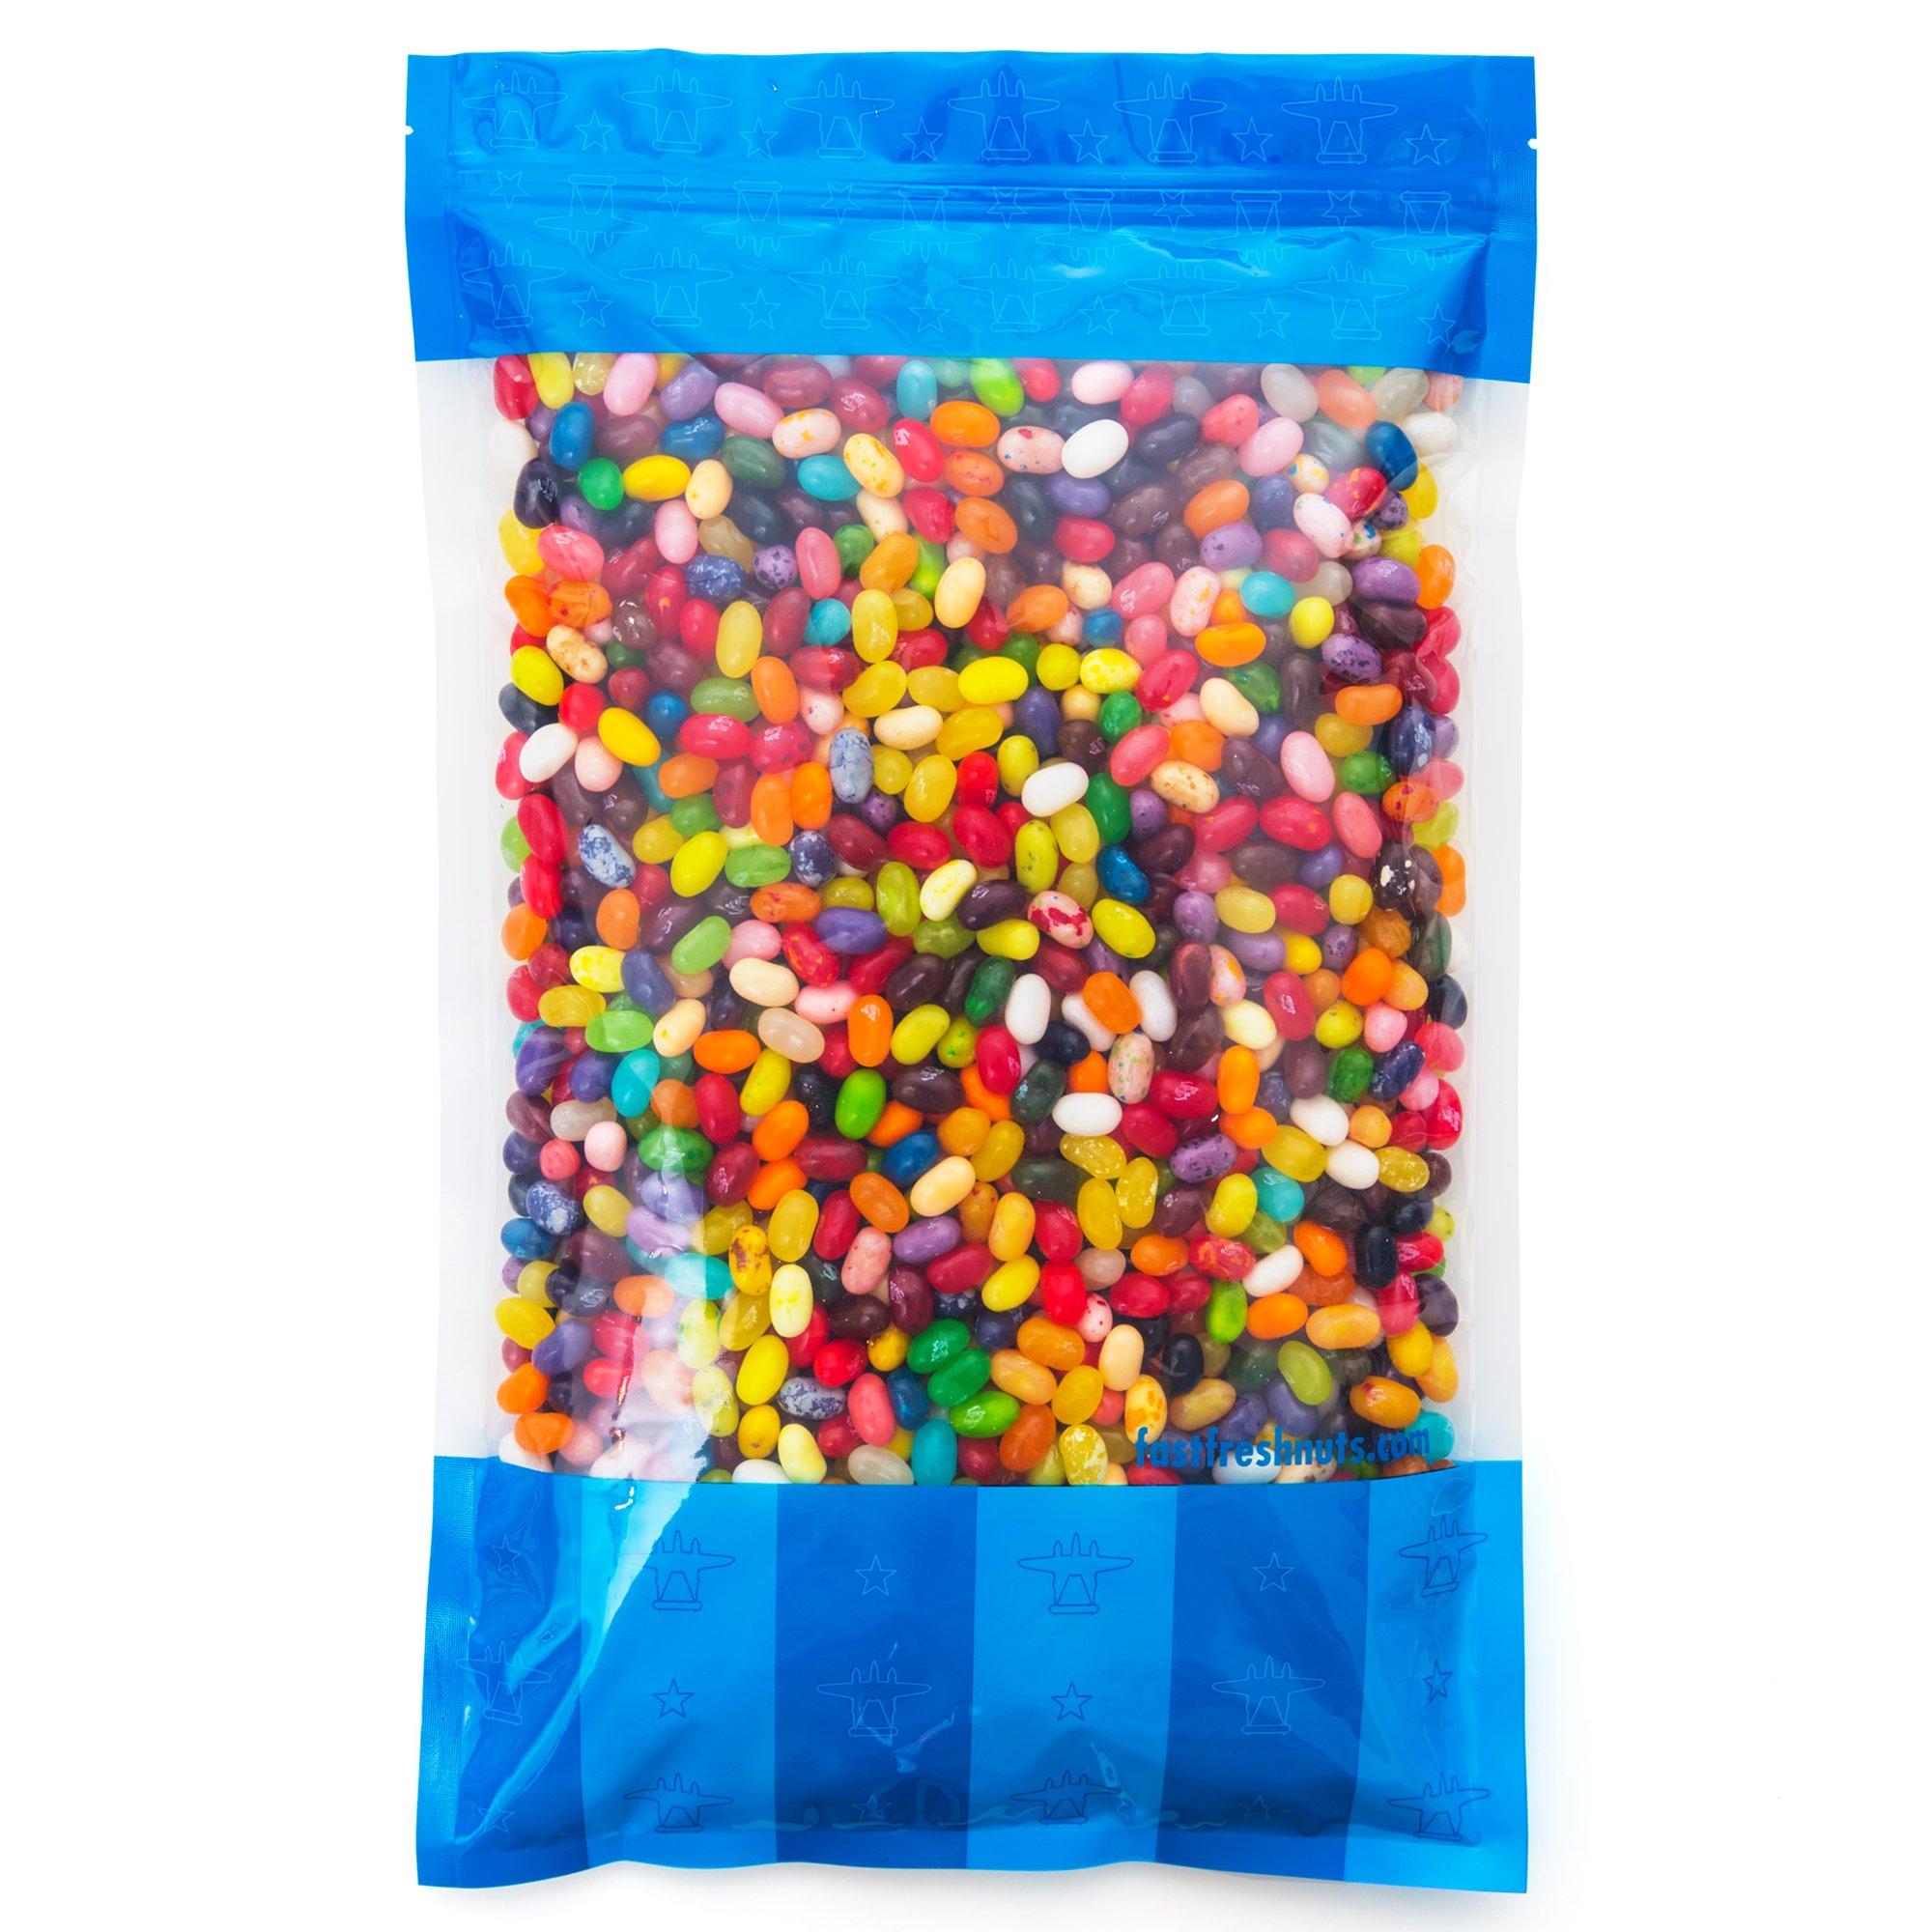 10 Pound Bulk Bomber Bag Jelly Belly 49 Flavors